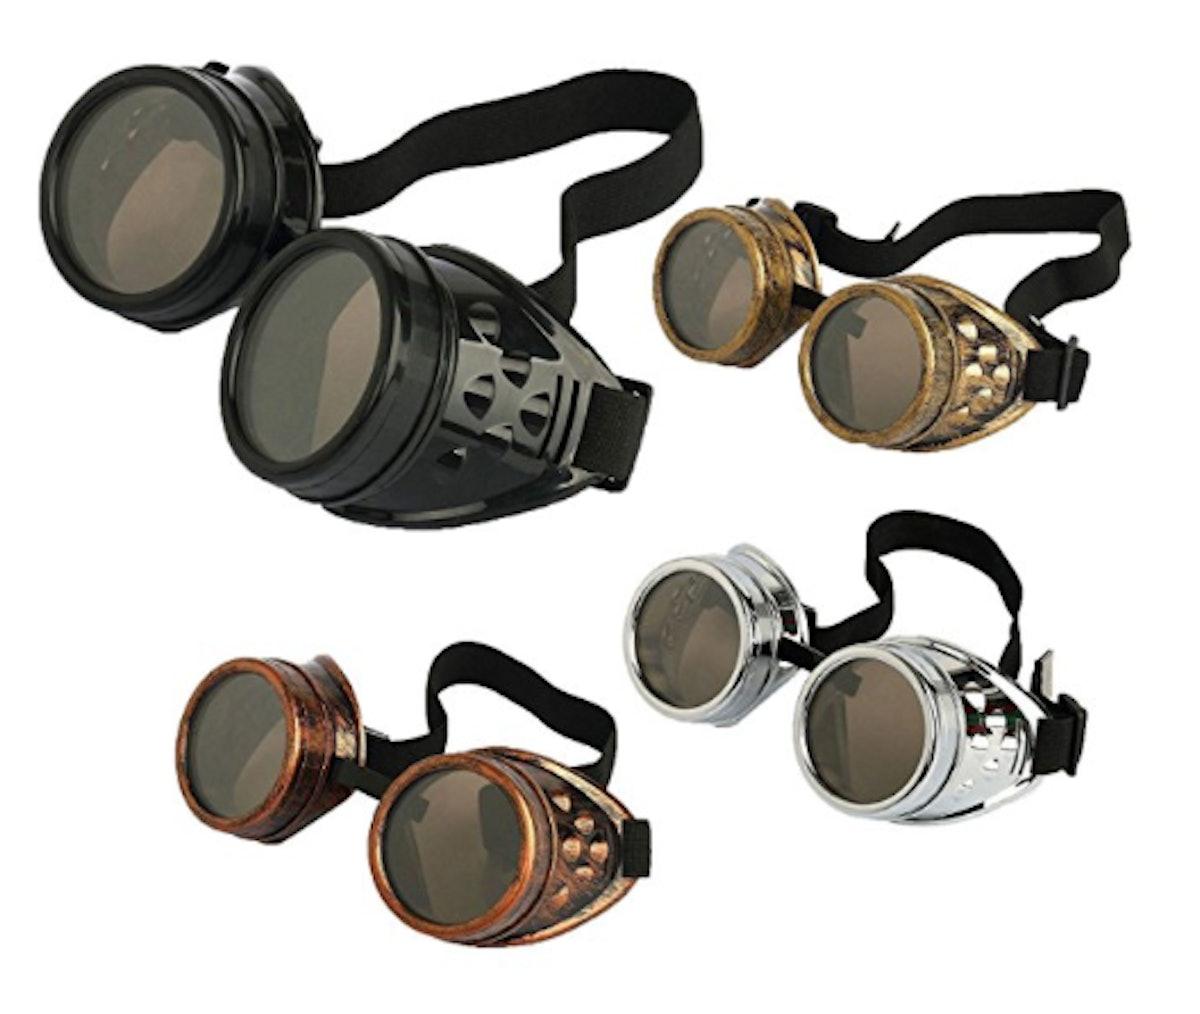 Retro Vintage Victoria Steampunk Goggles